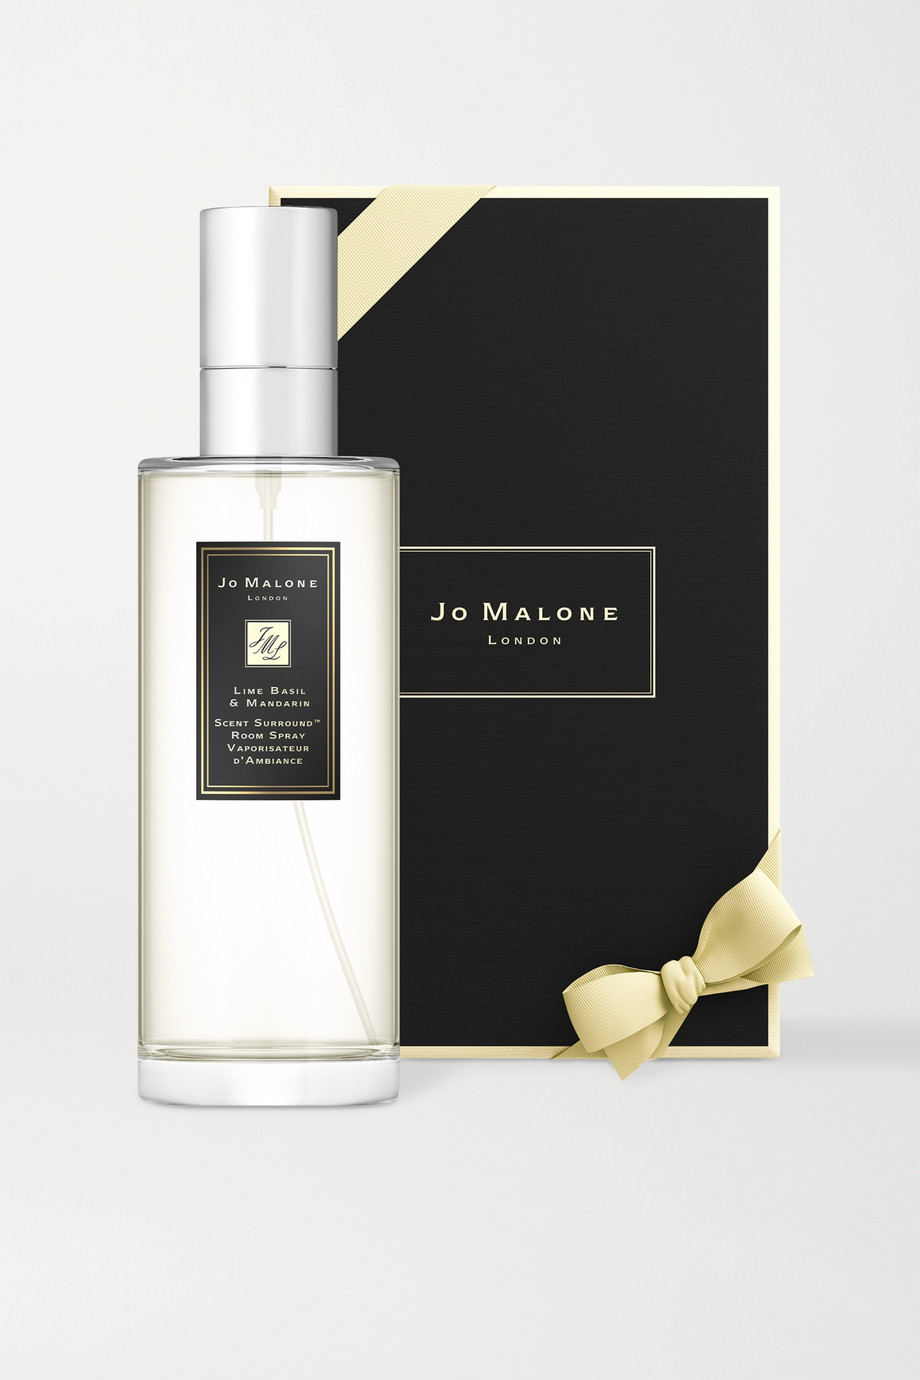 Jo Malone London Scent Surround Room Spray - Lime Basil & Mandarin, 175ml